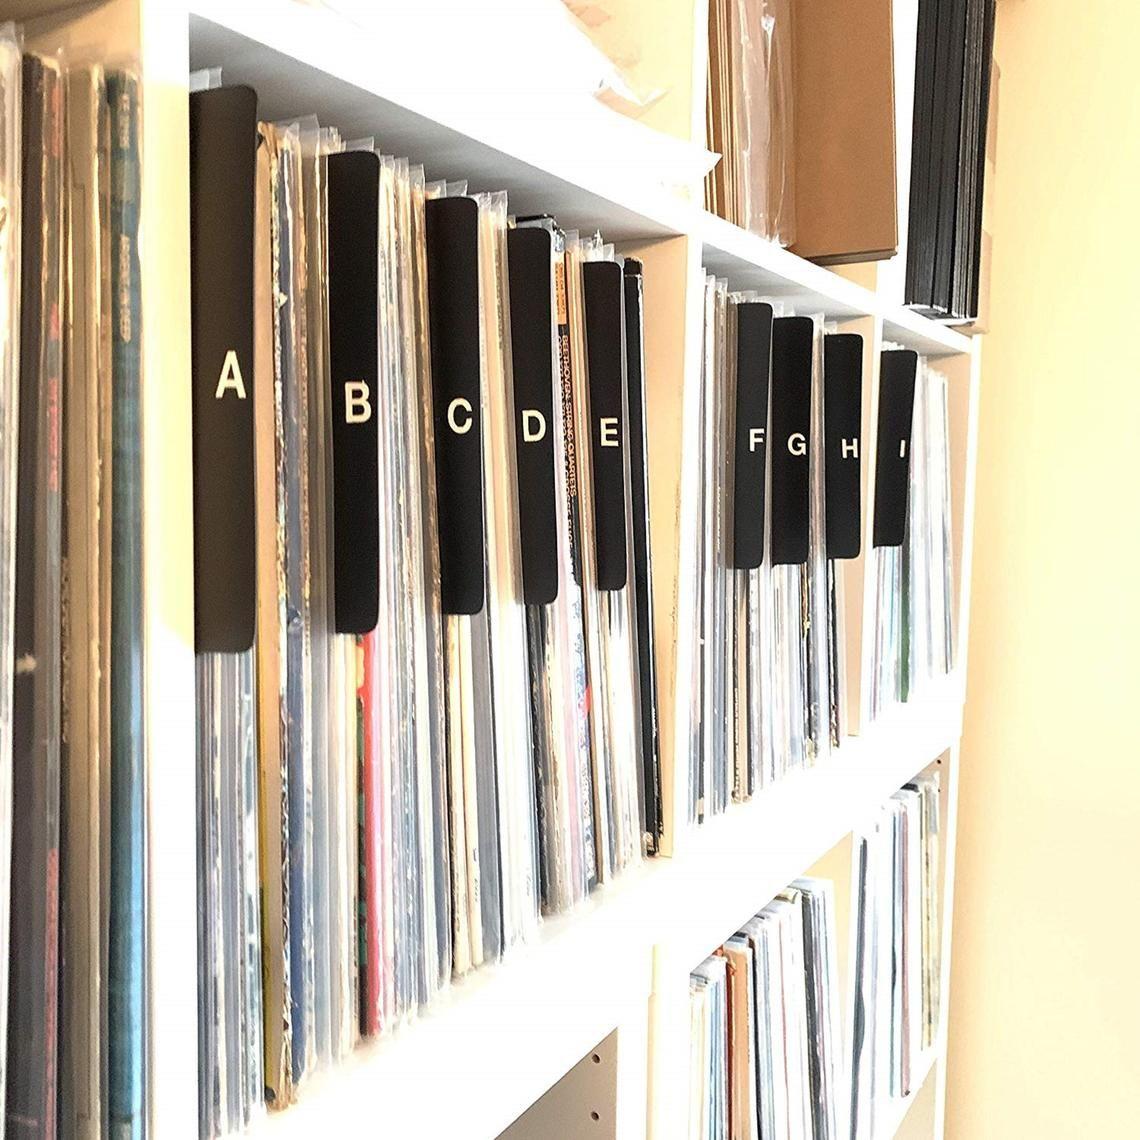 A Z Black Alphabetical Record Dividers Cards 12 Inch 33rpm Etsy In 2020 Record Dividers Vinyl Record Storage Record Album Storage